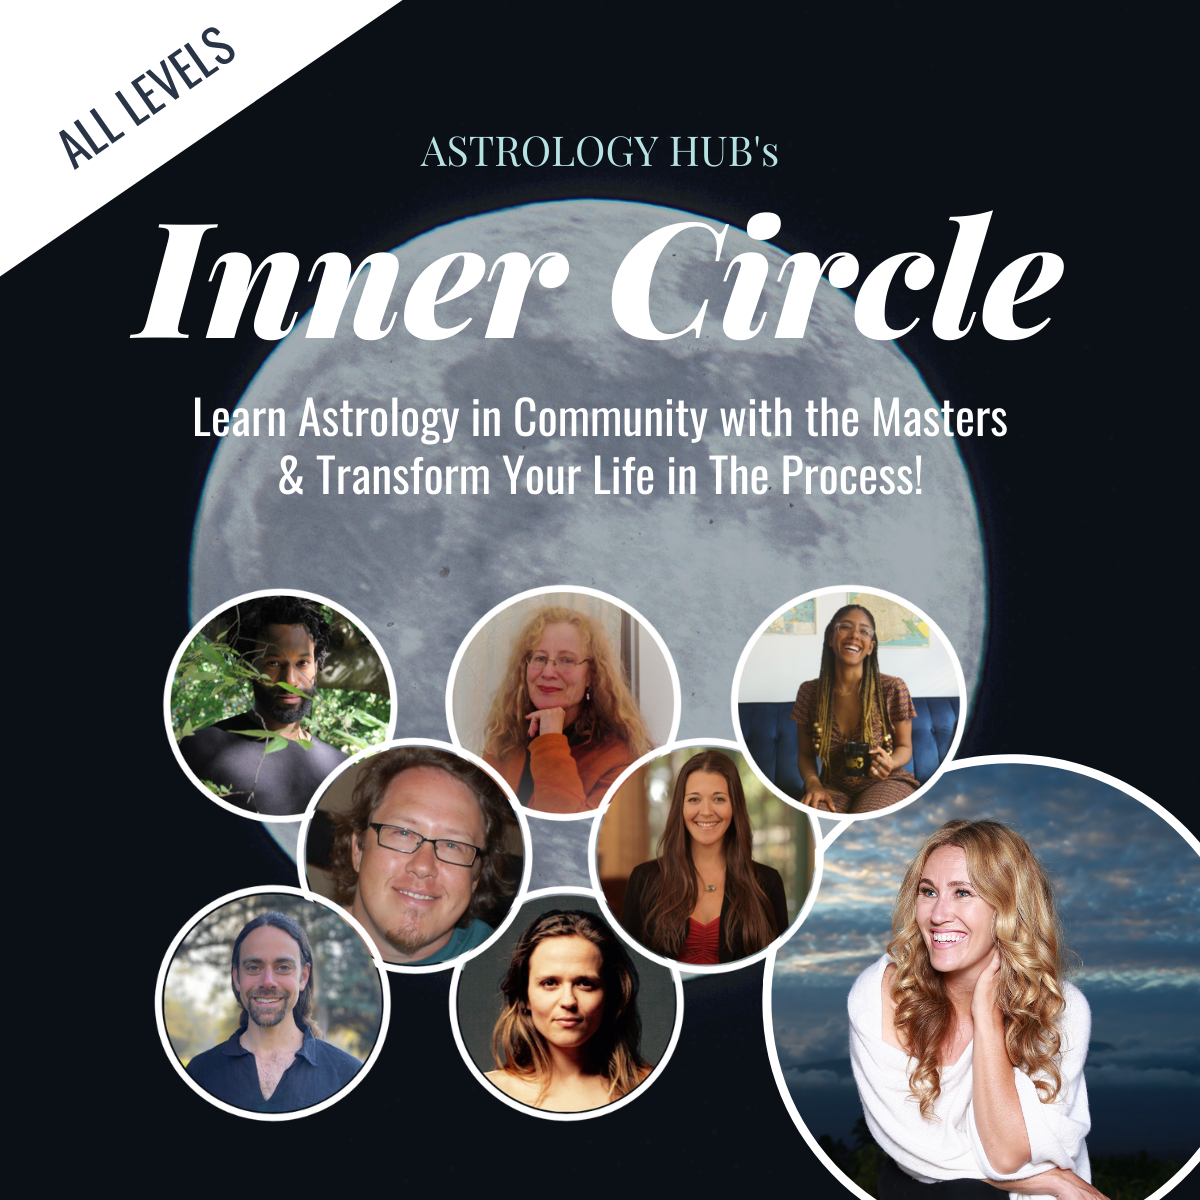 Astrology Hub's Inner Circle 2021